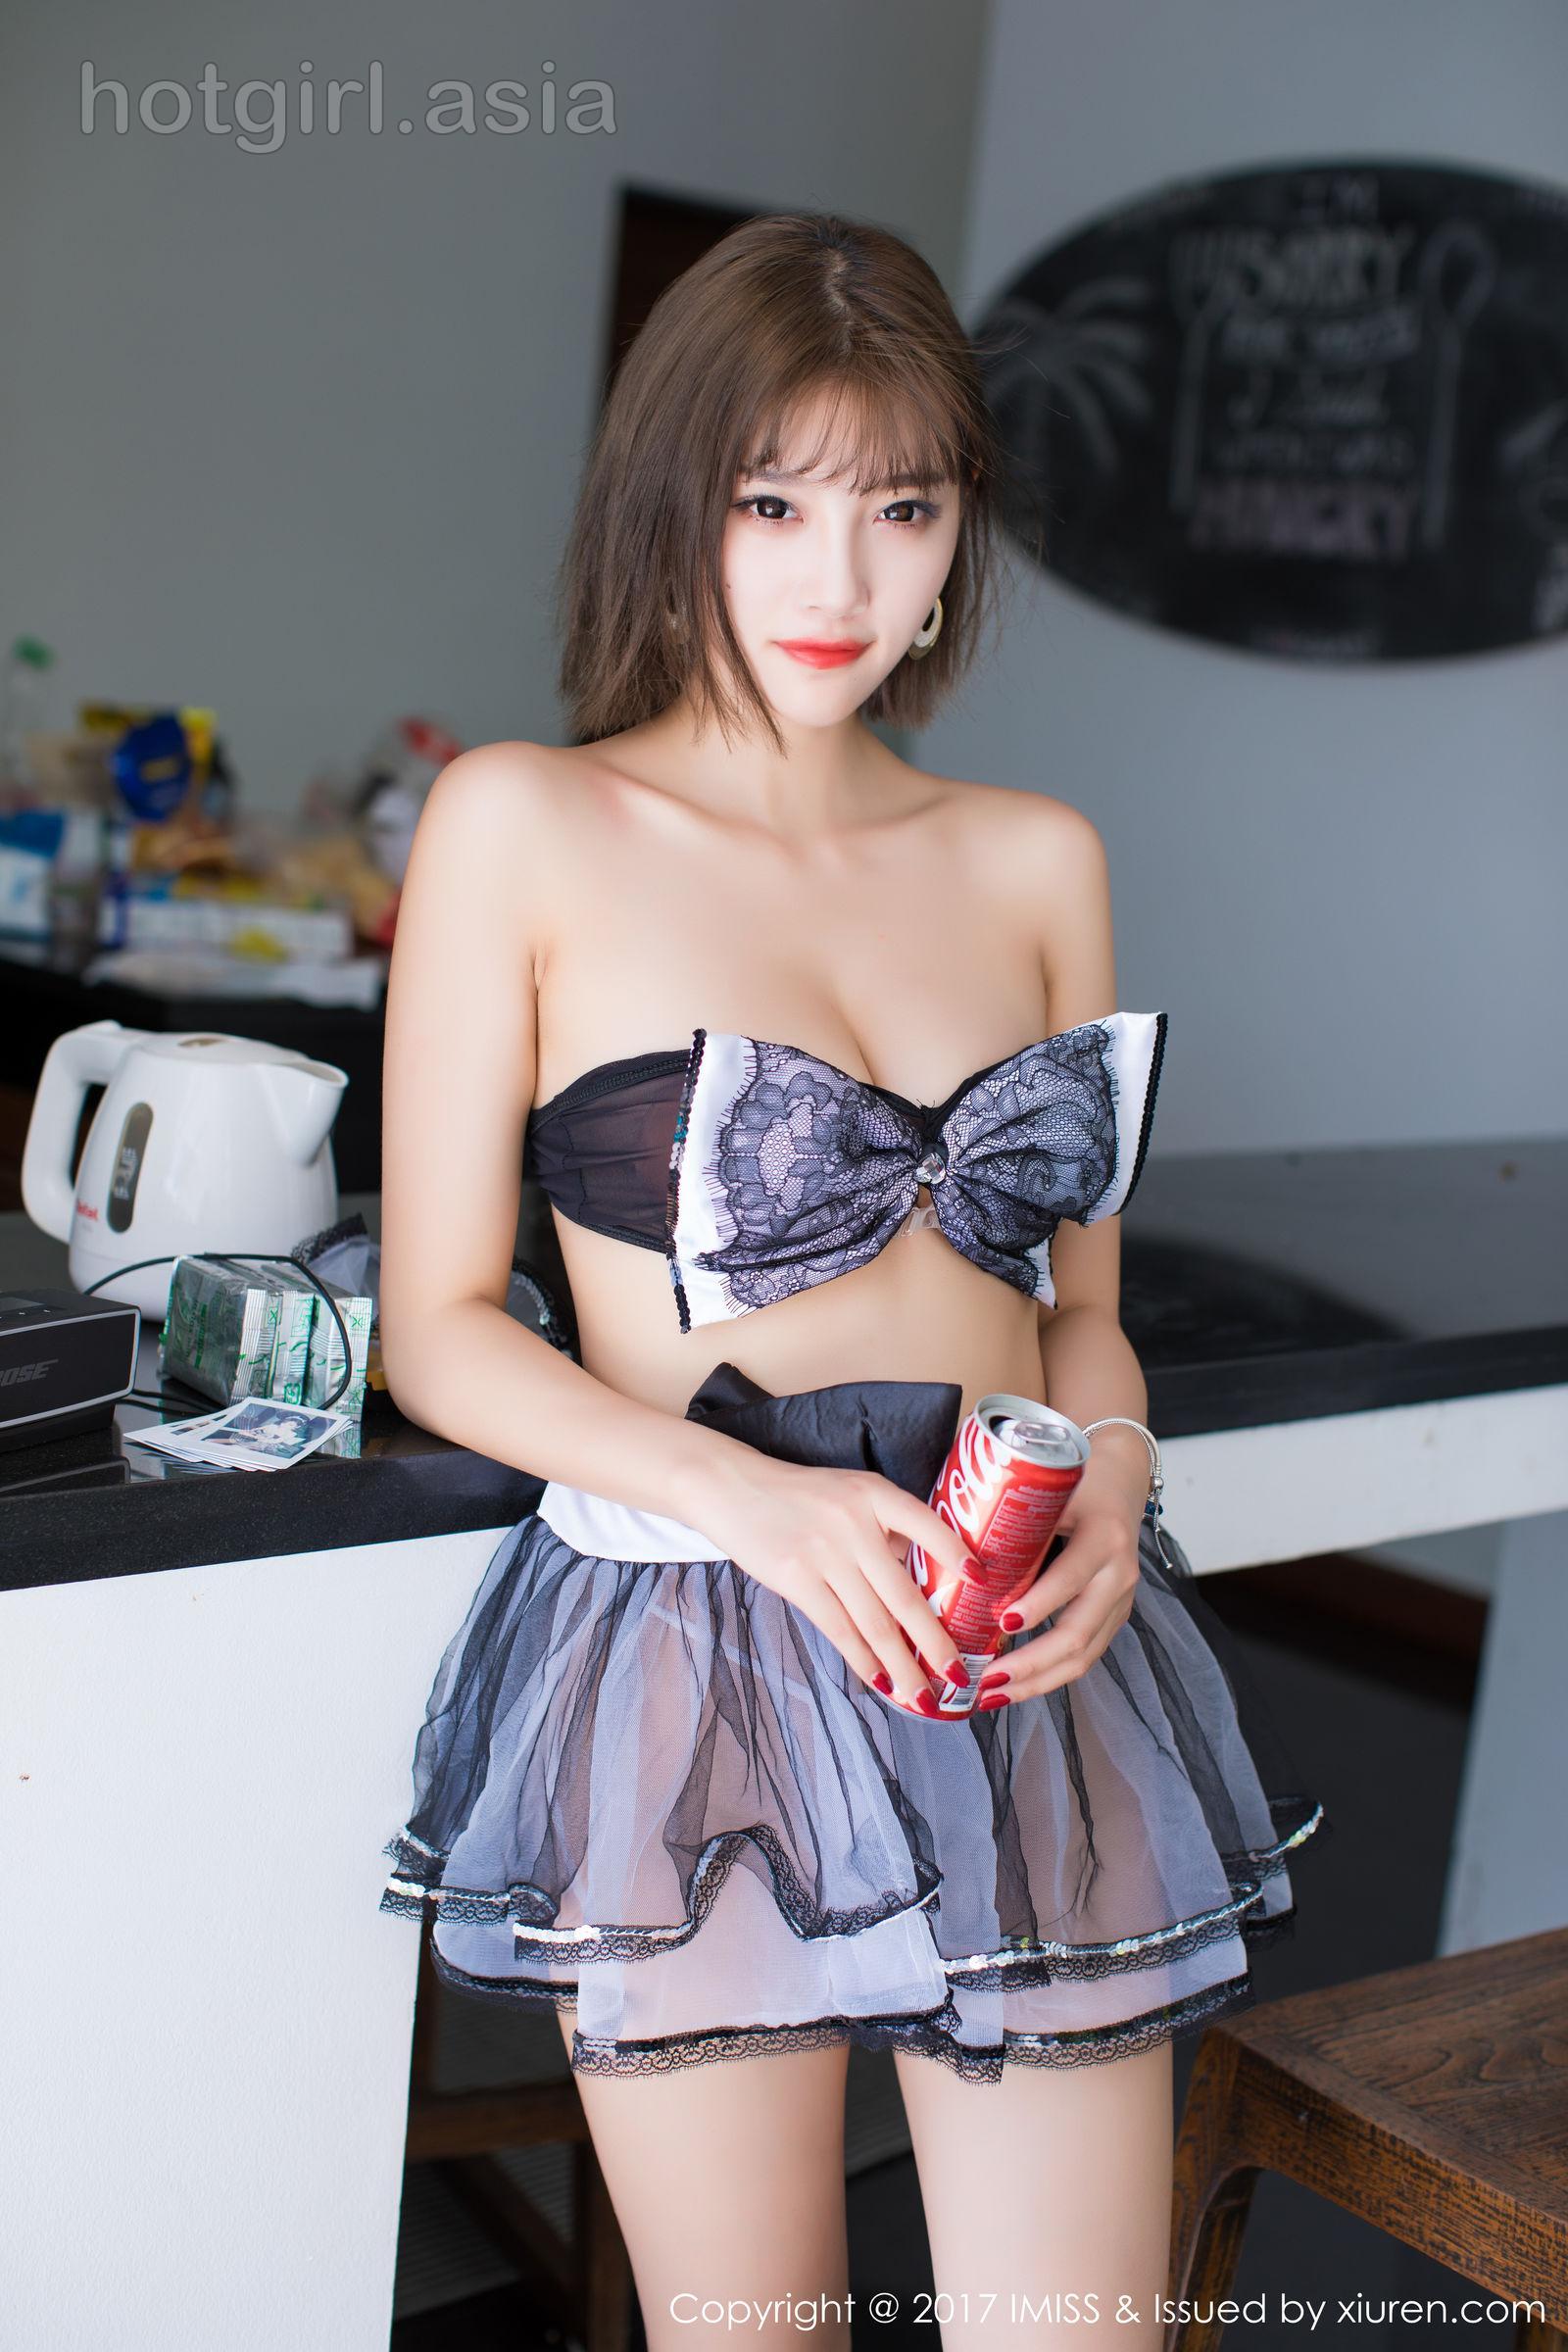 [IMiss 爱 蜜 社] Vol.201 Goddess @ 杨晨晨 sugar-Krabi travel photo shoot